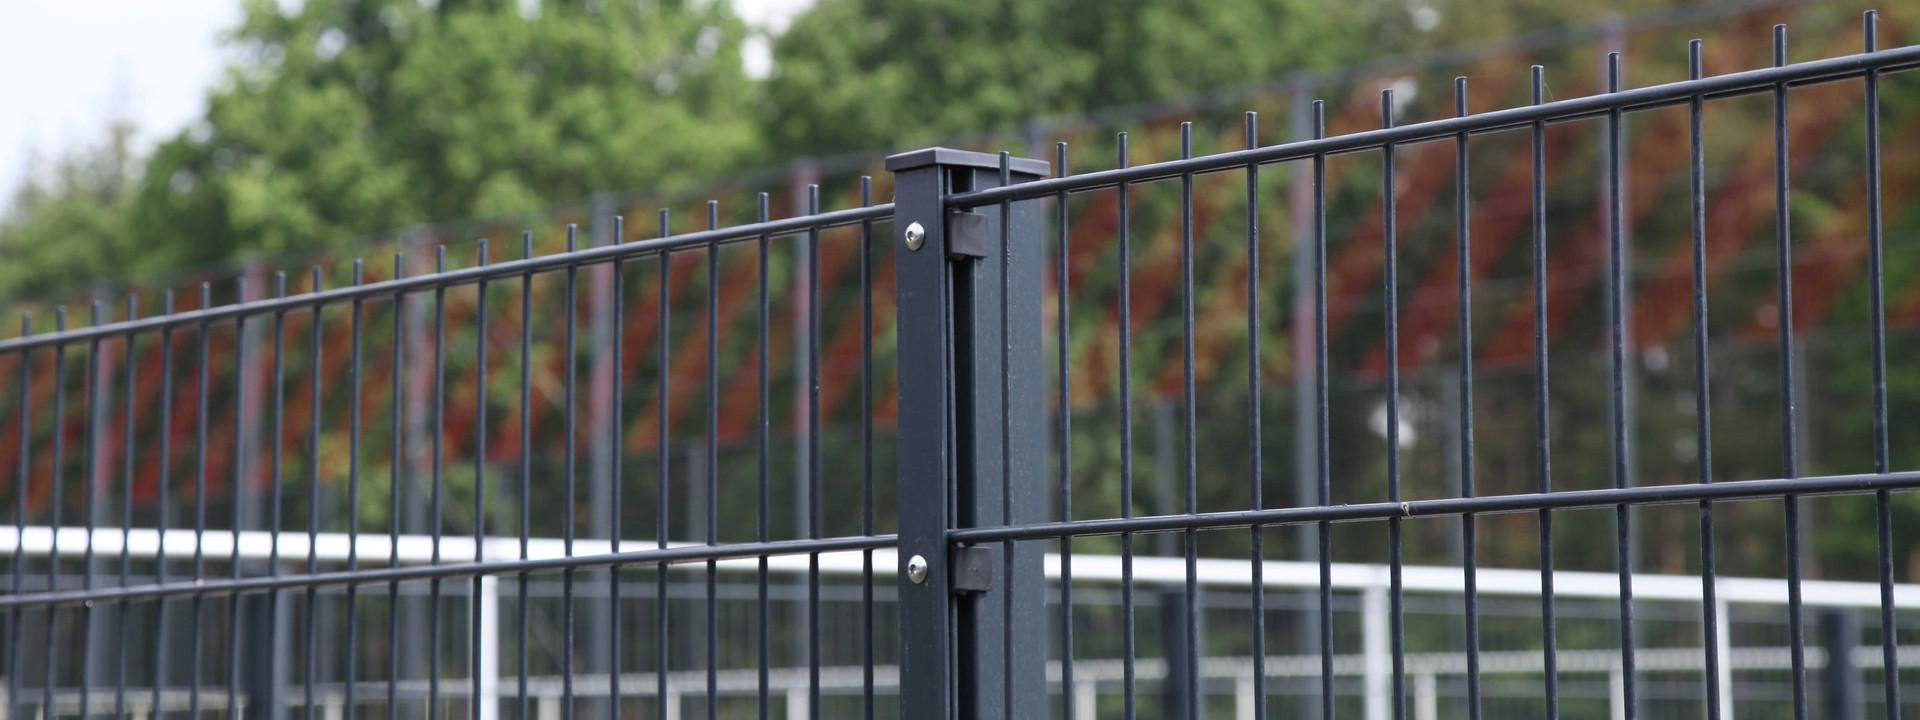 Zaun und Zaunpfosten